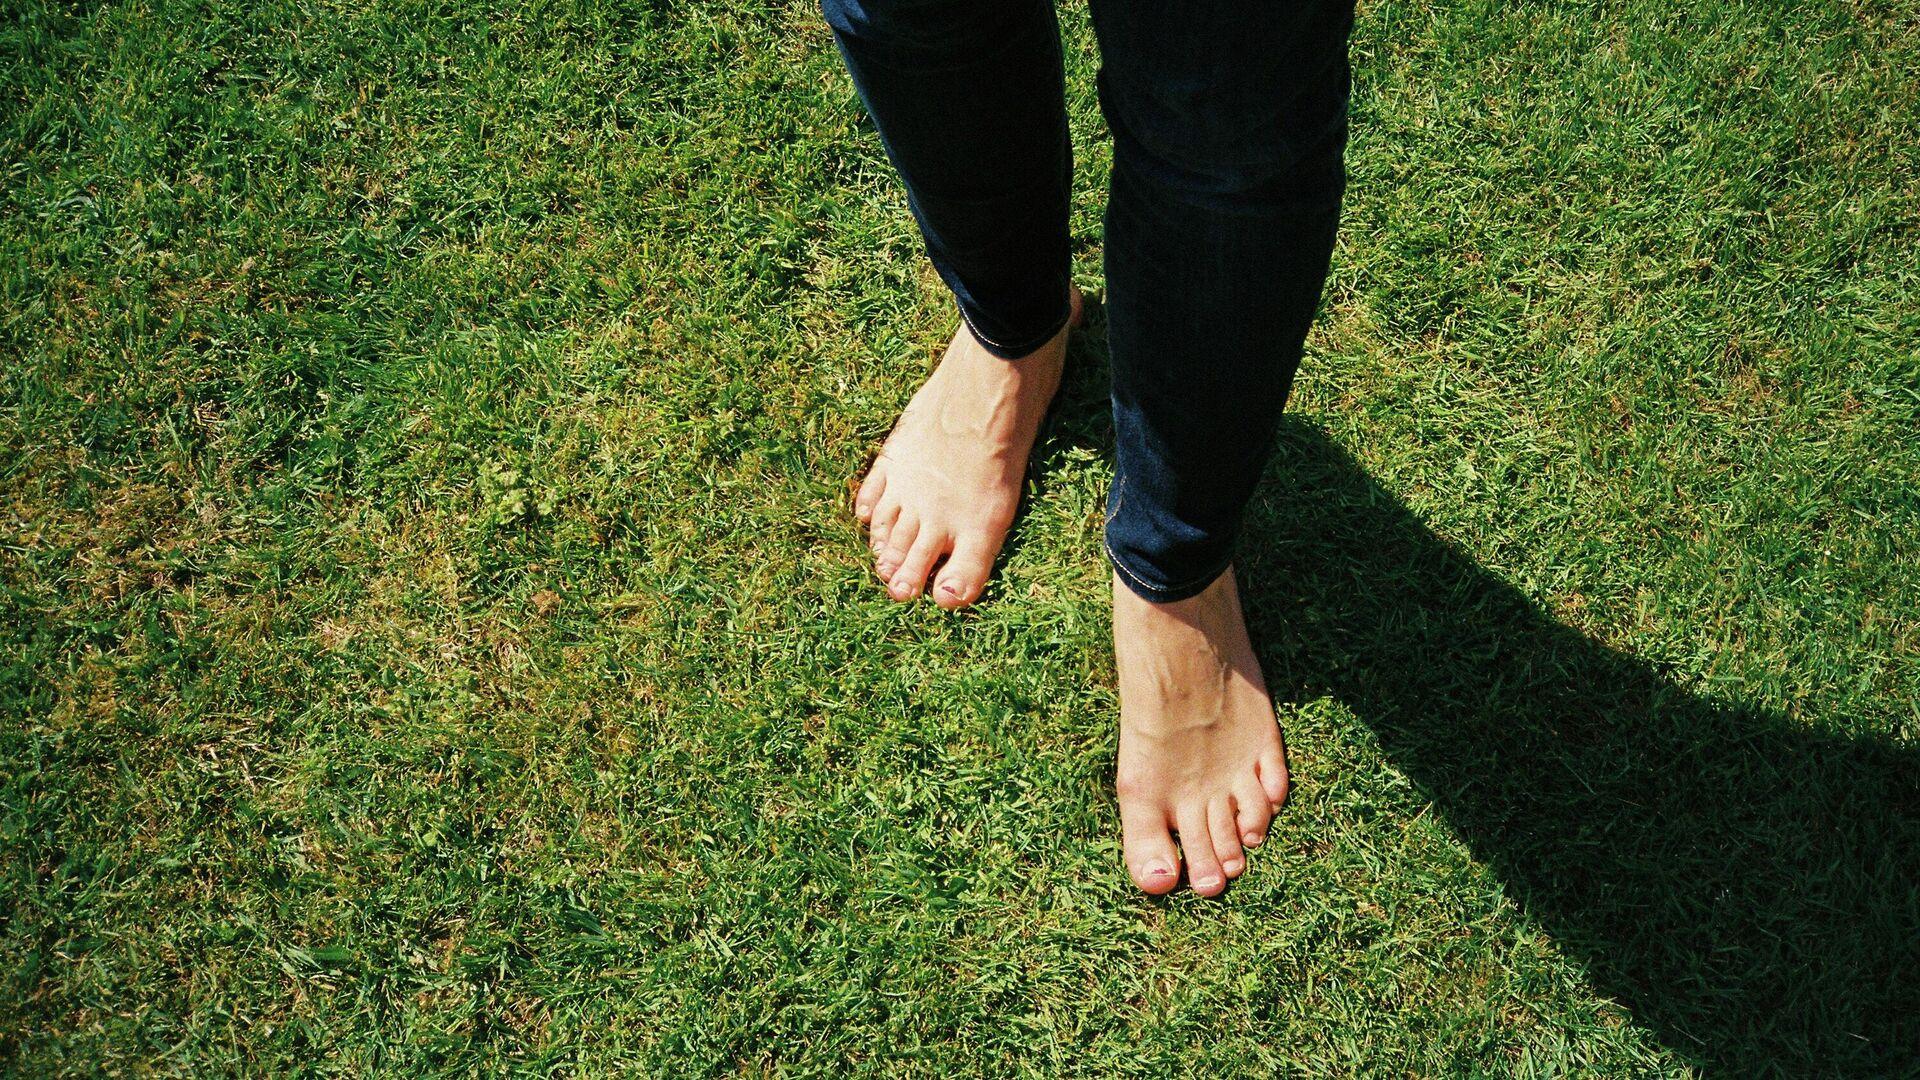 Una persona camina sin zapatos - Sputnik Mundo, 1920, 05.07.2021